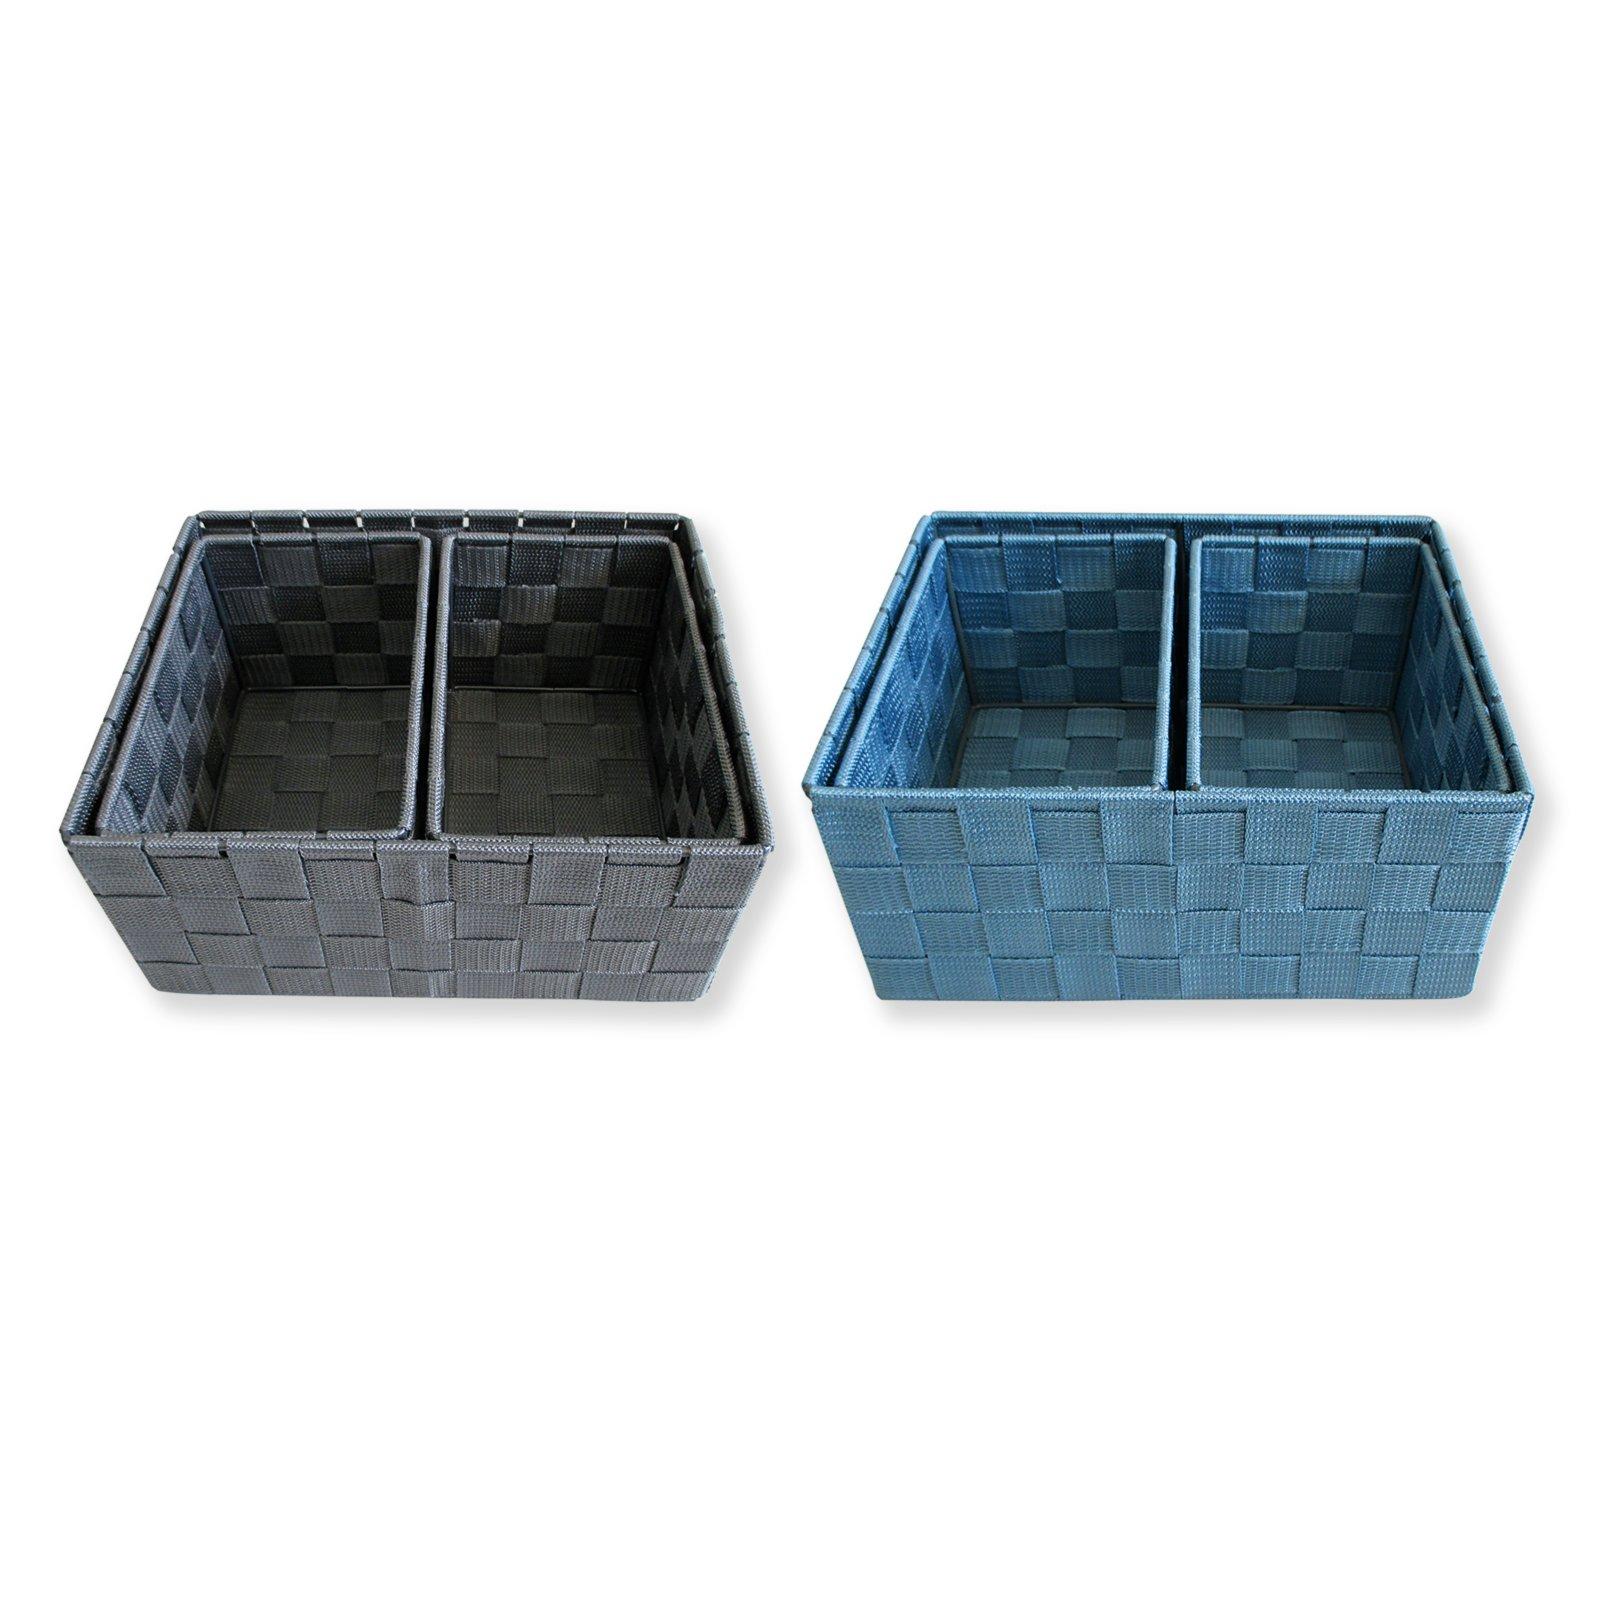 aufbewahrungsk rbe keine farbauswahl 3 teilig. Black Bedroom Furniture Sets. Home Design Ideas